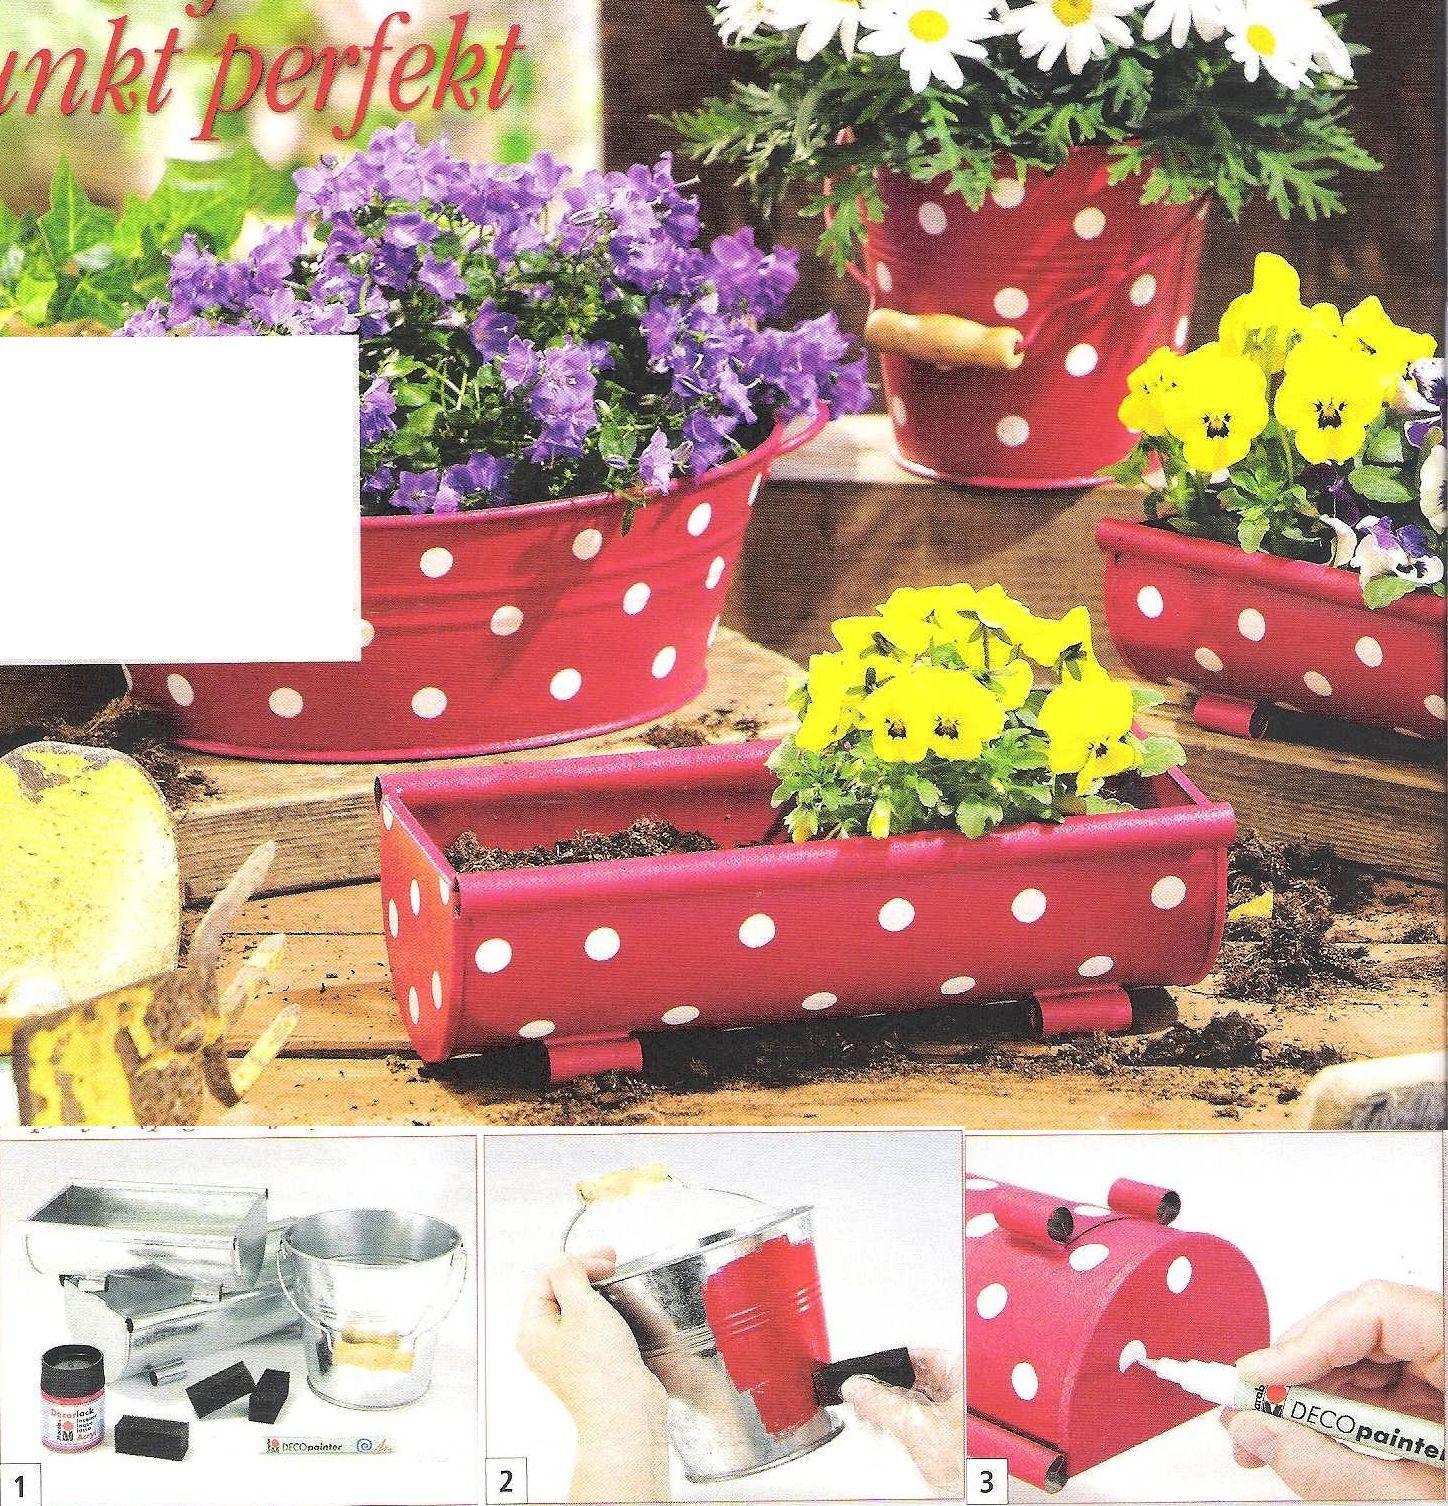 Saturday, February 9th 2013. williamhill konto gesperrt click and buy | Bedroom Ideas , DIY , Girl Room Ideas